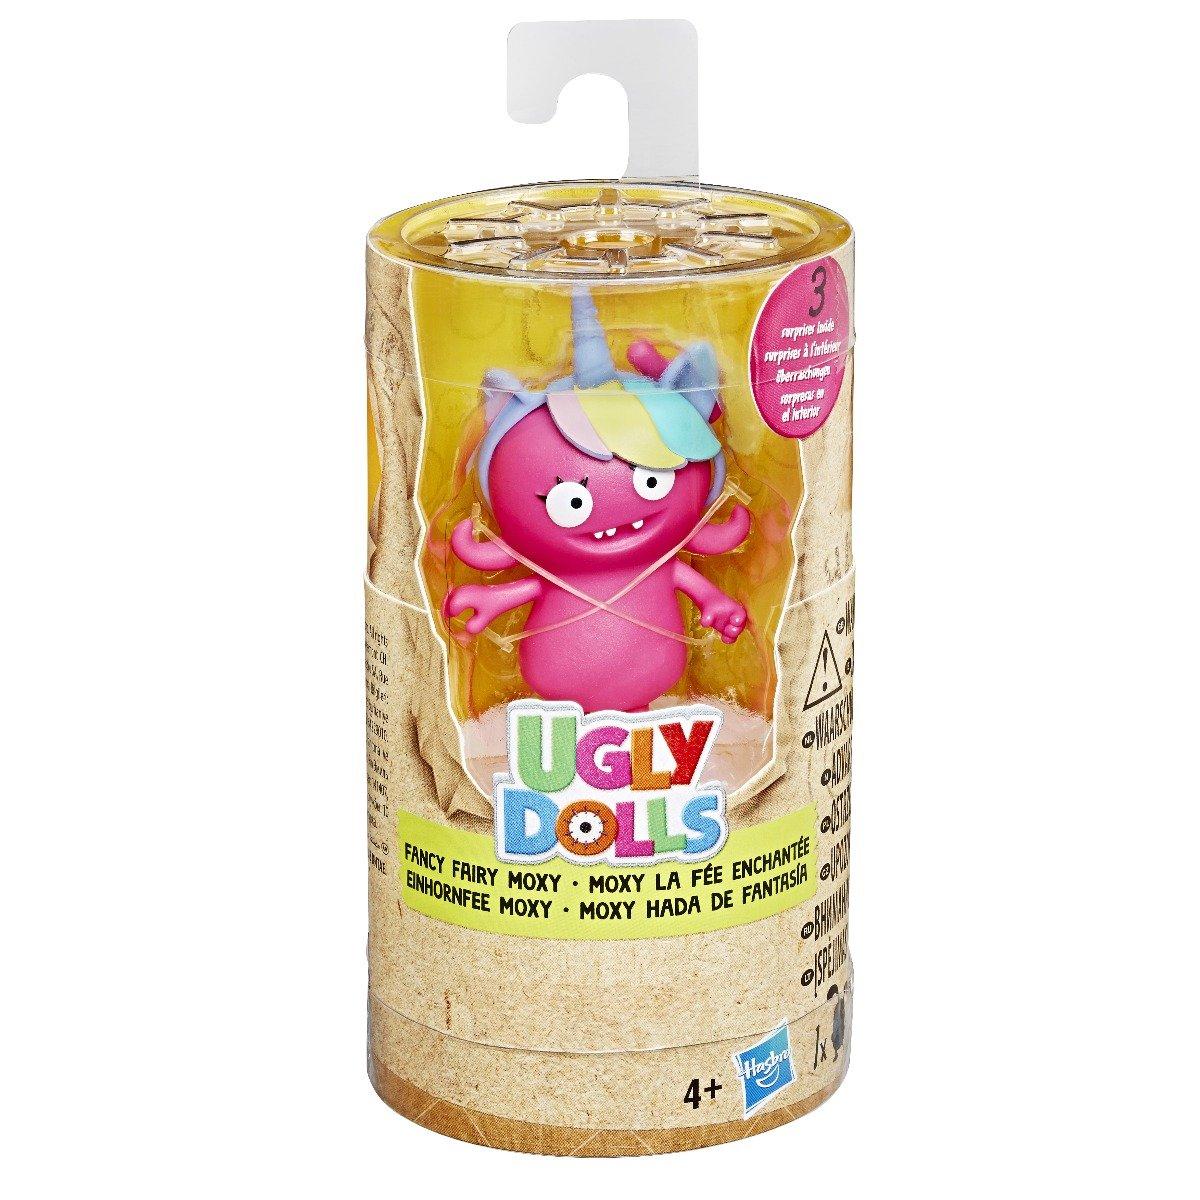 Figurina cu accesorii Ugly Dolls, Moxy (E4541)